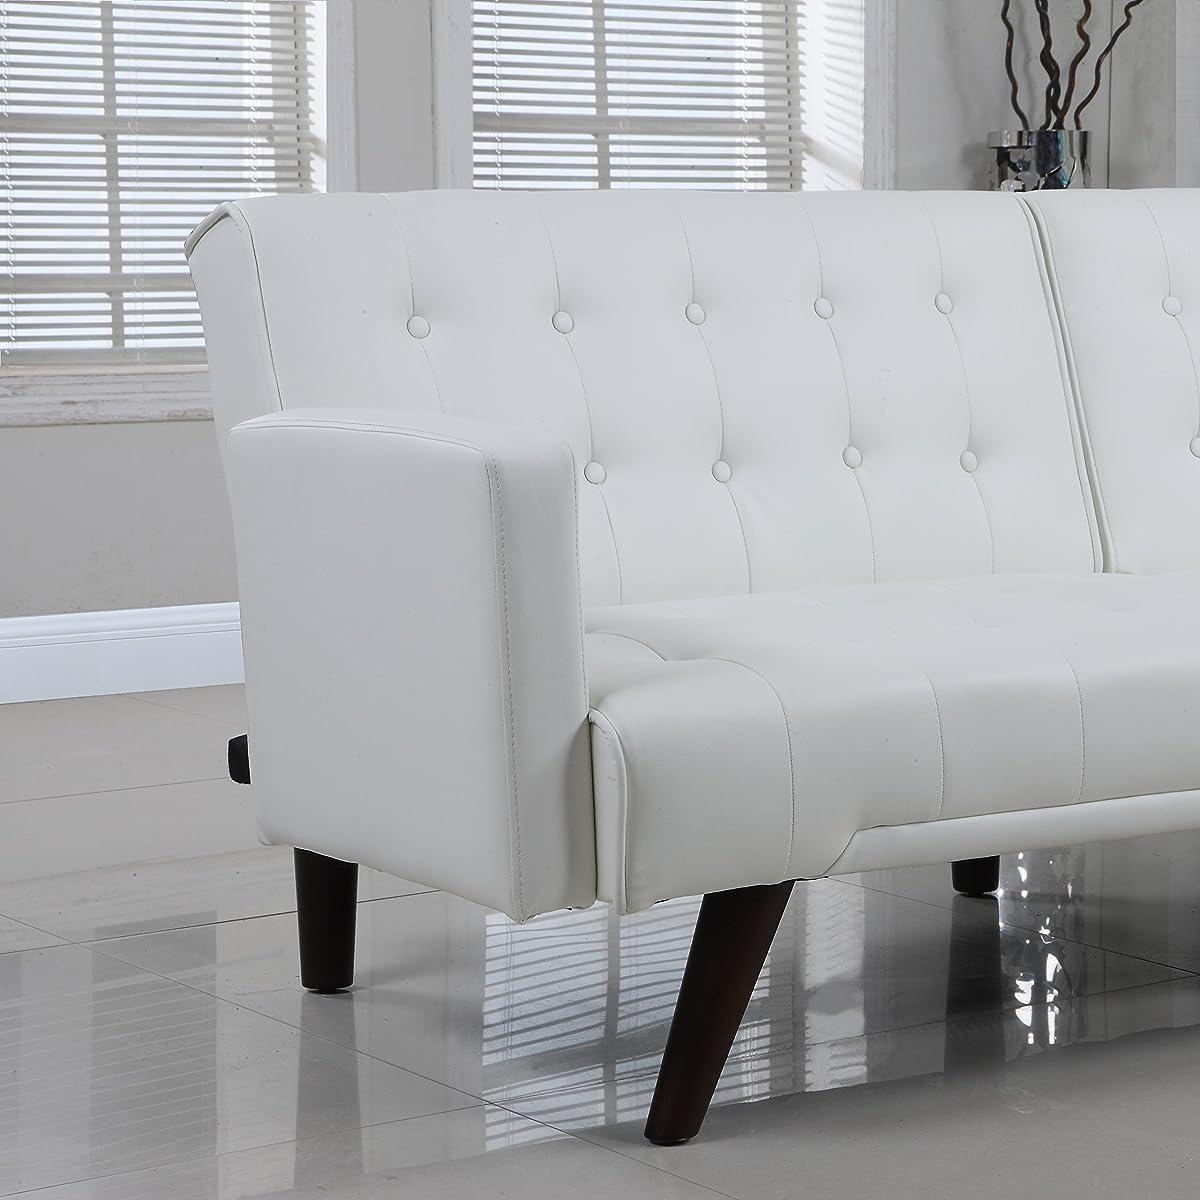 Modern Convertible Tufted Bonded Leather Splitback Sleeper Sofa Futon (White)